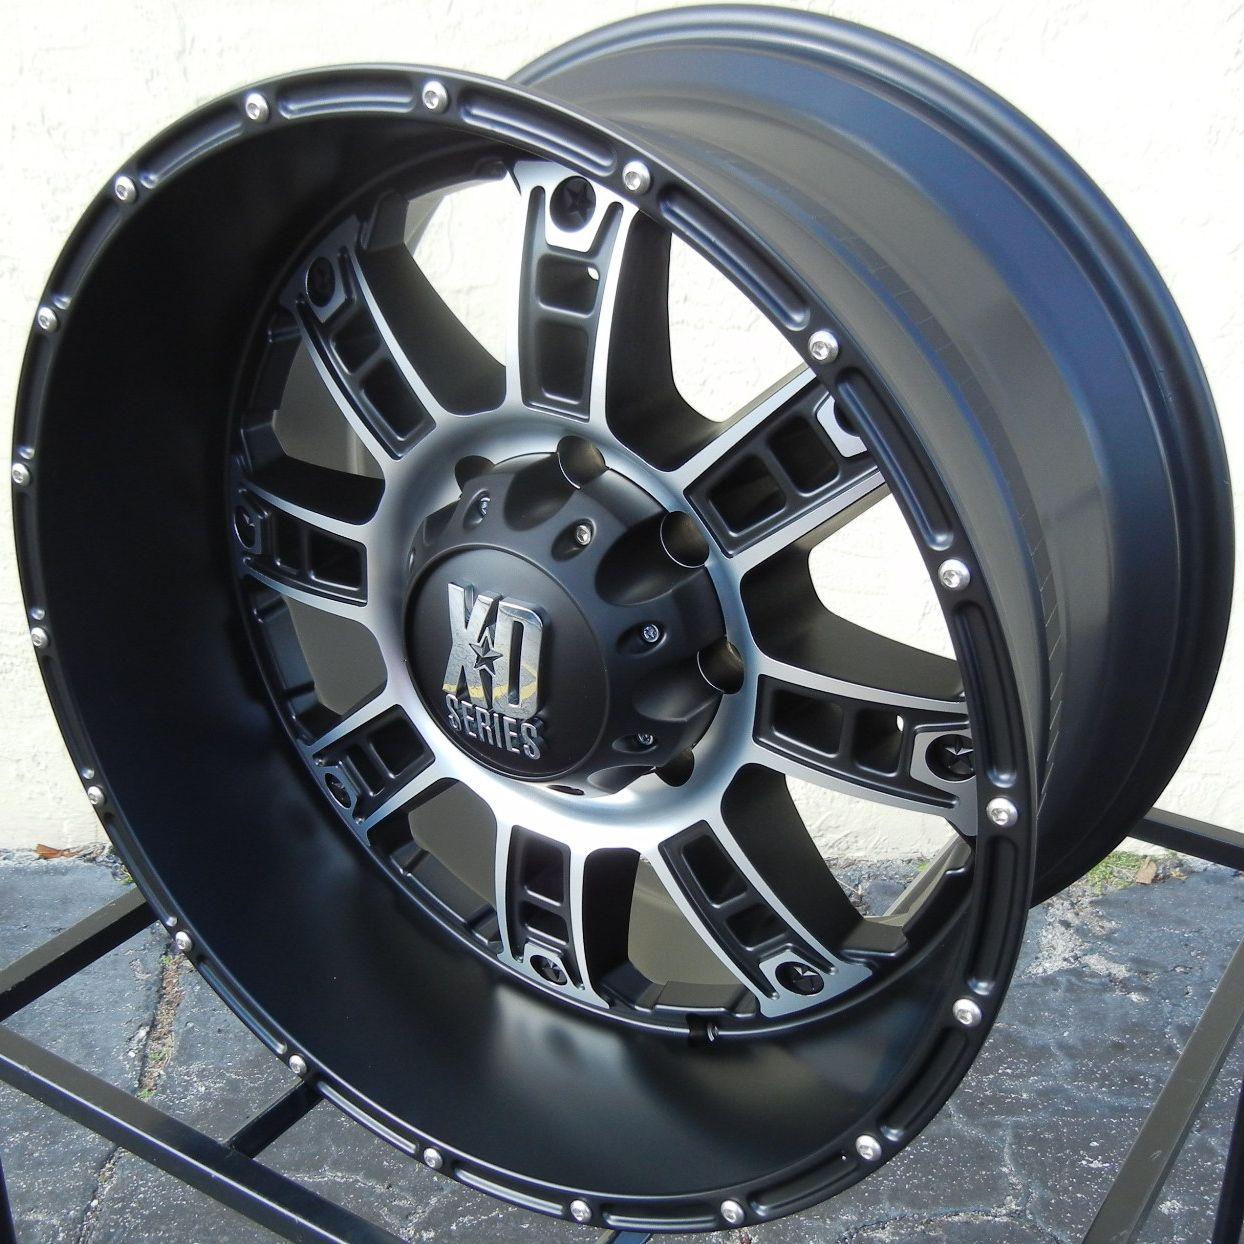 20 New Black XD Riot Wheels Rims Chevy Silverado GMC Dodge 2500 3500